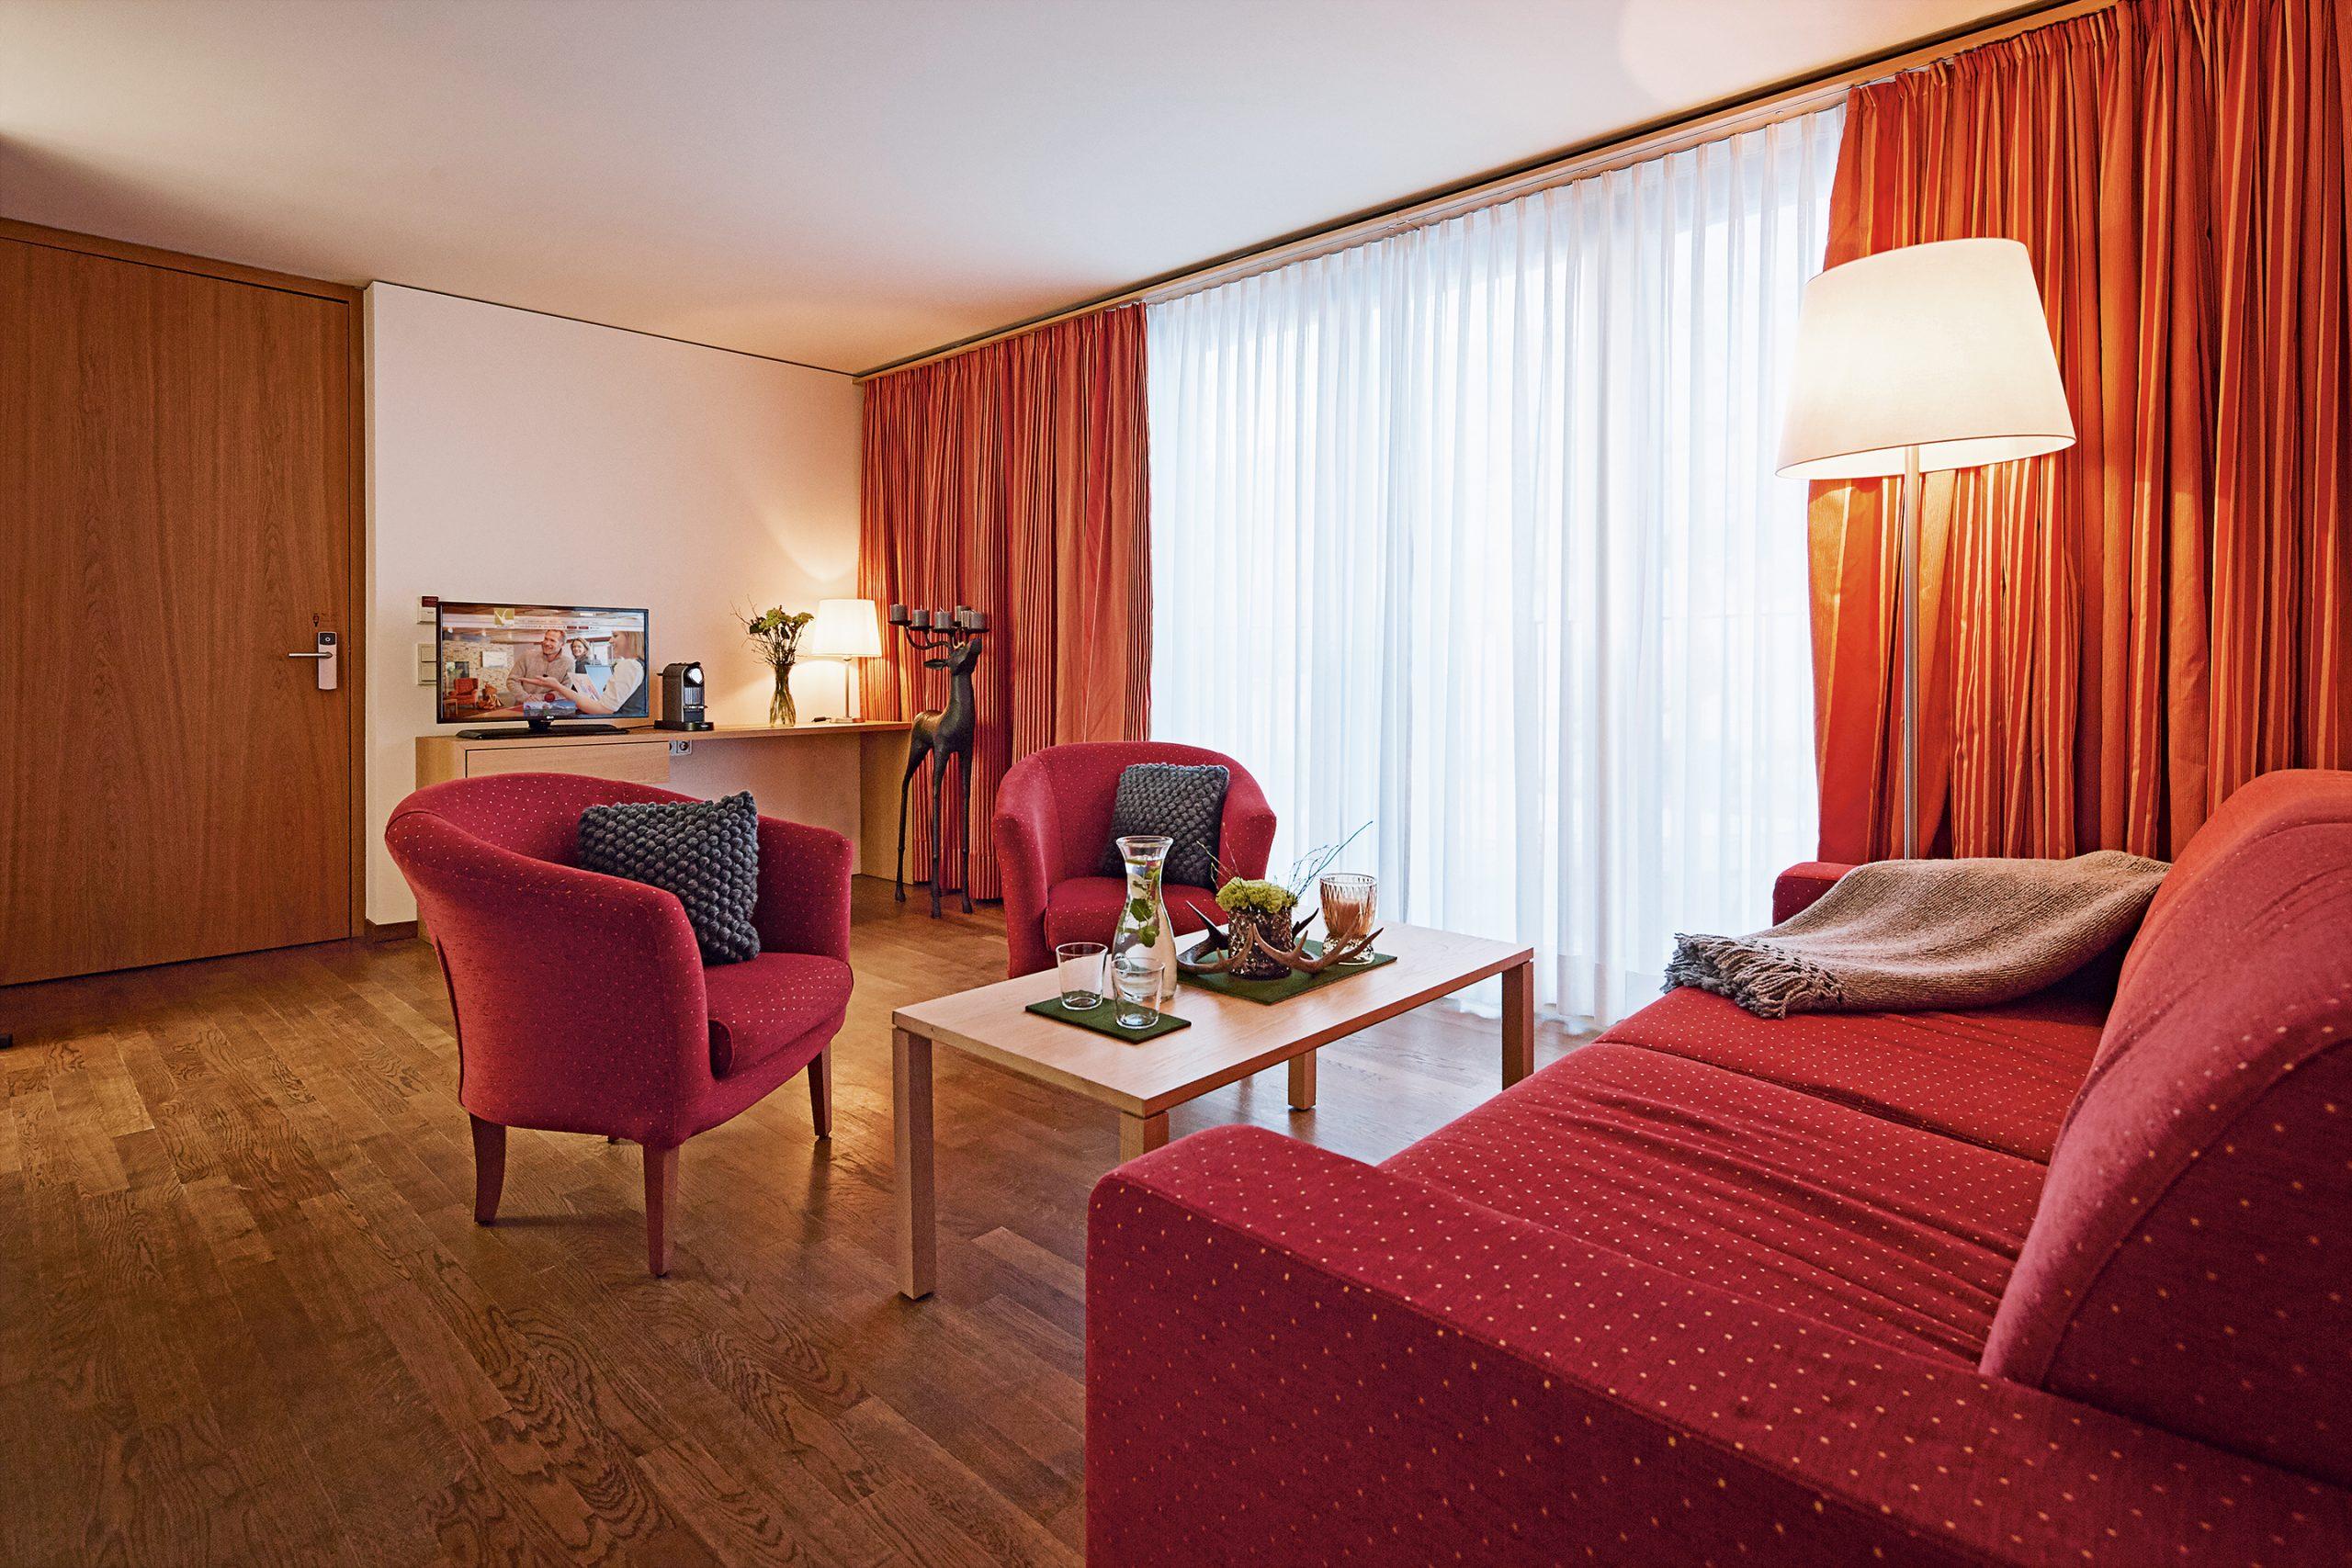 Suite Lech Hotel Vorarlberg